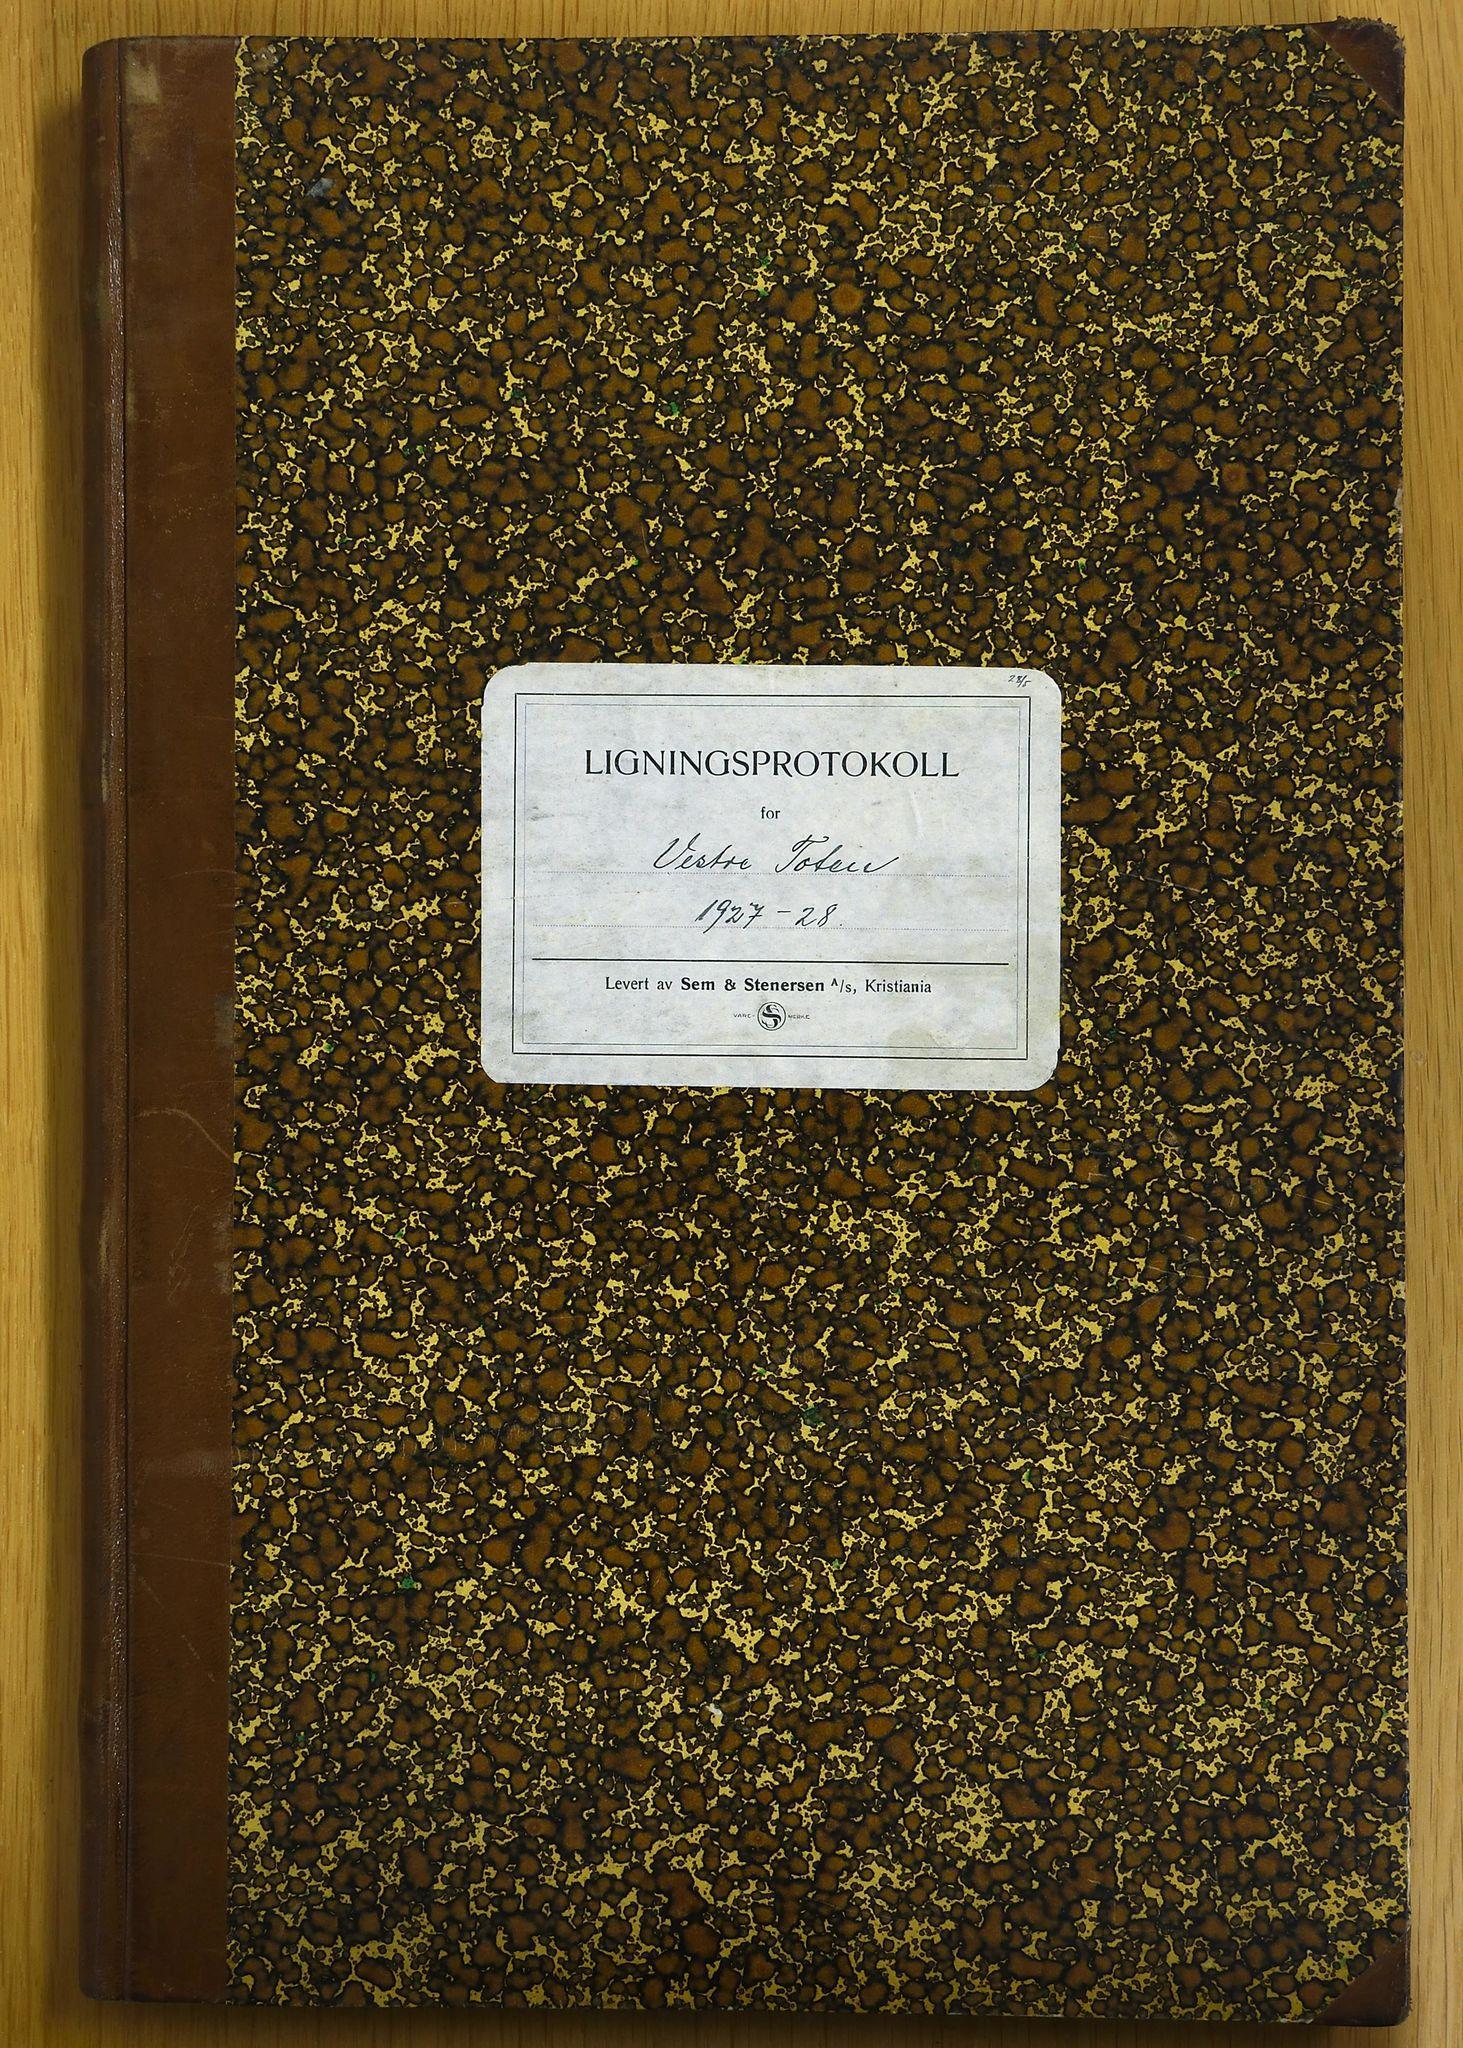 KVT, Vestre Toten municipal archive: Vestre Toten municipal, tax assessment protocol 1927-1928, 1927-1928